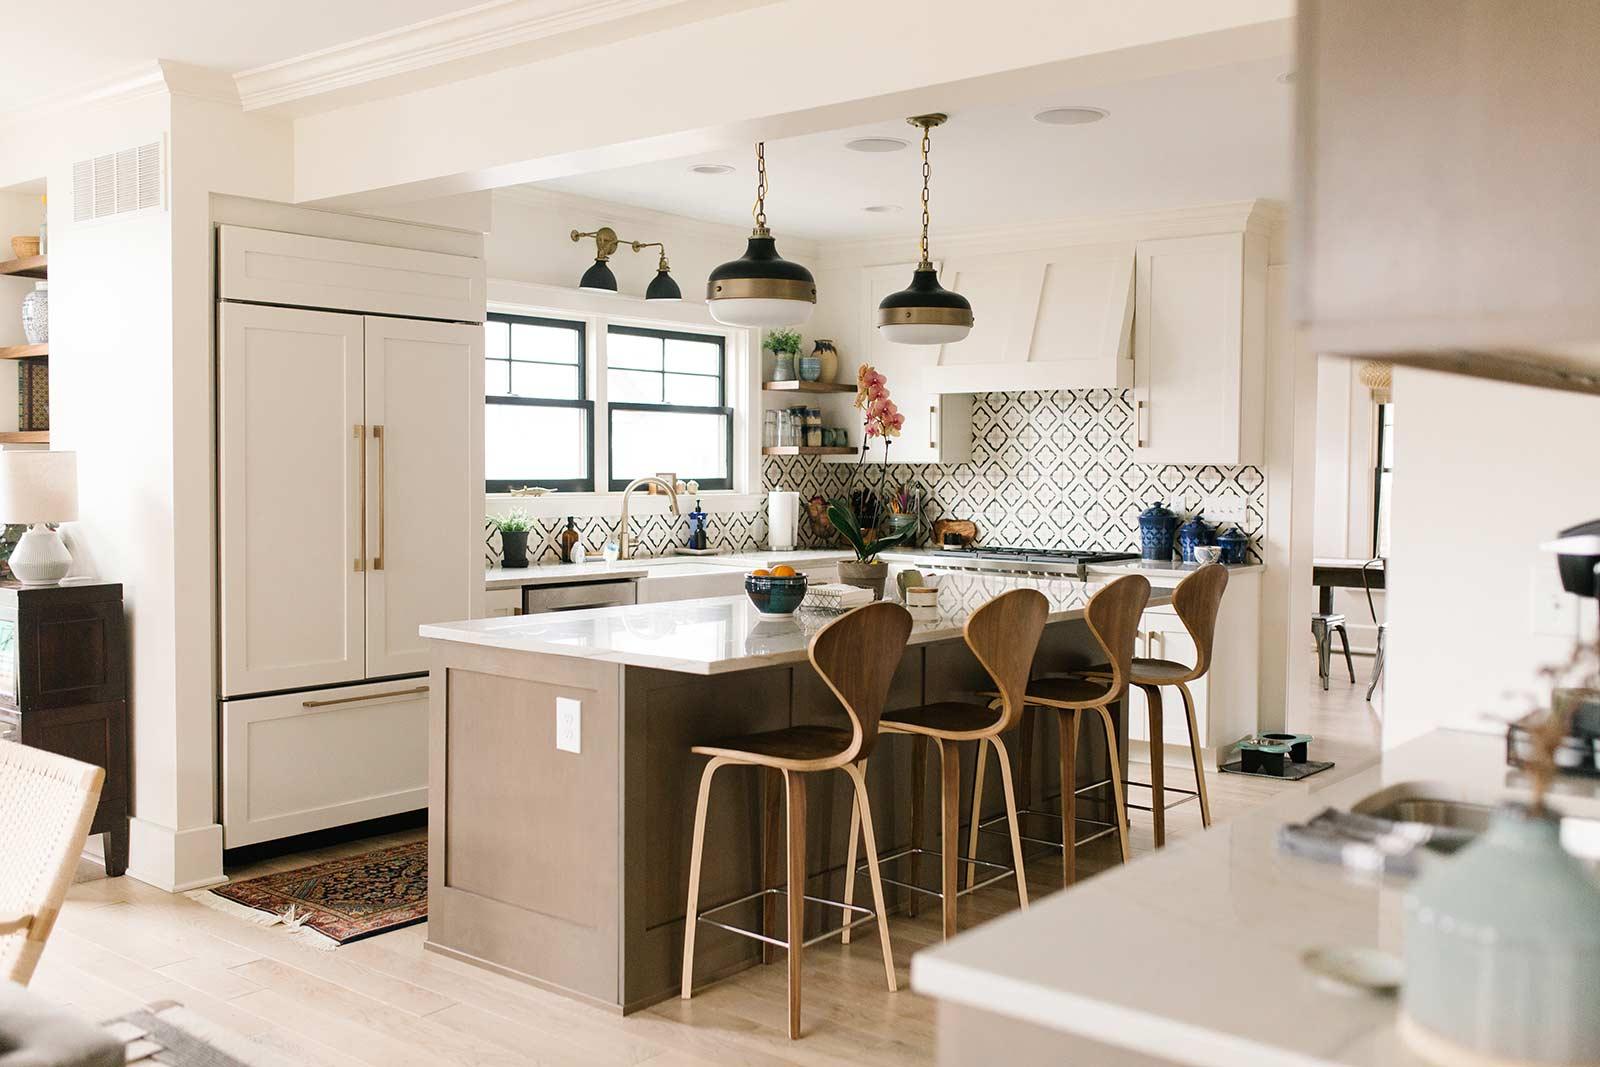 pomante home contractors kitchen remodel